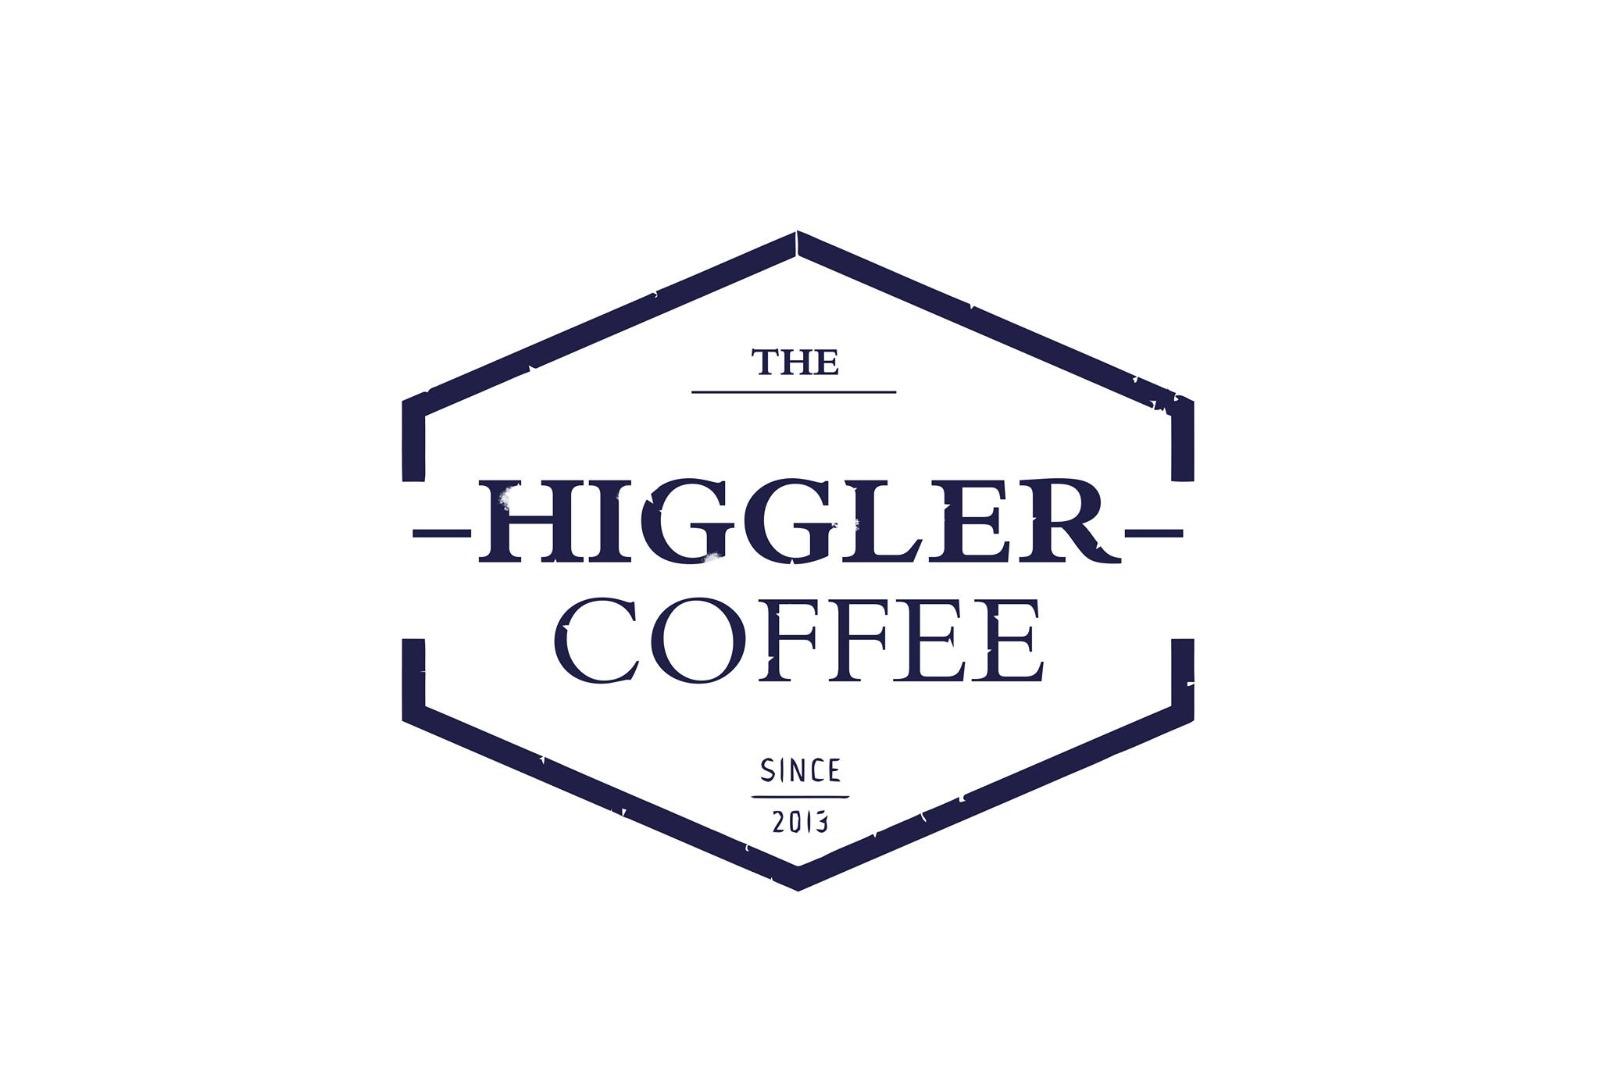 Higgler Coffee